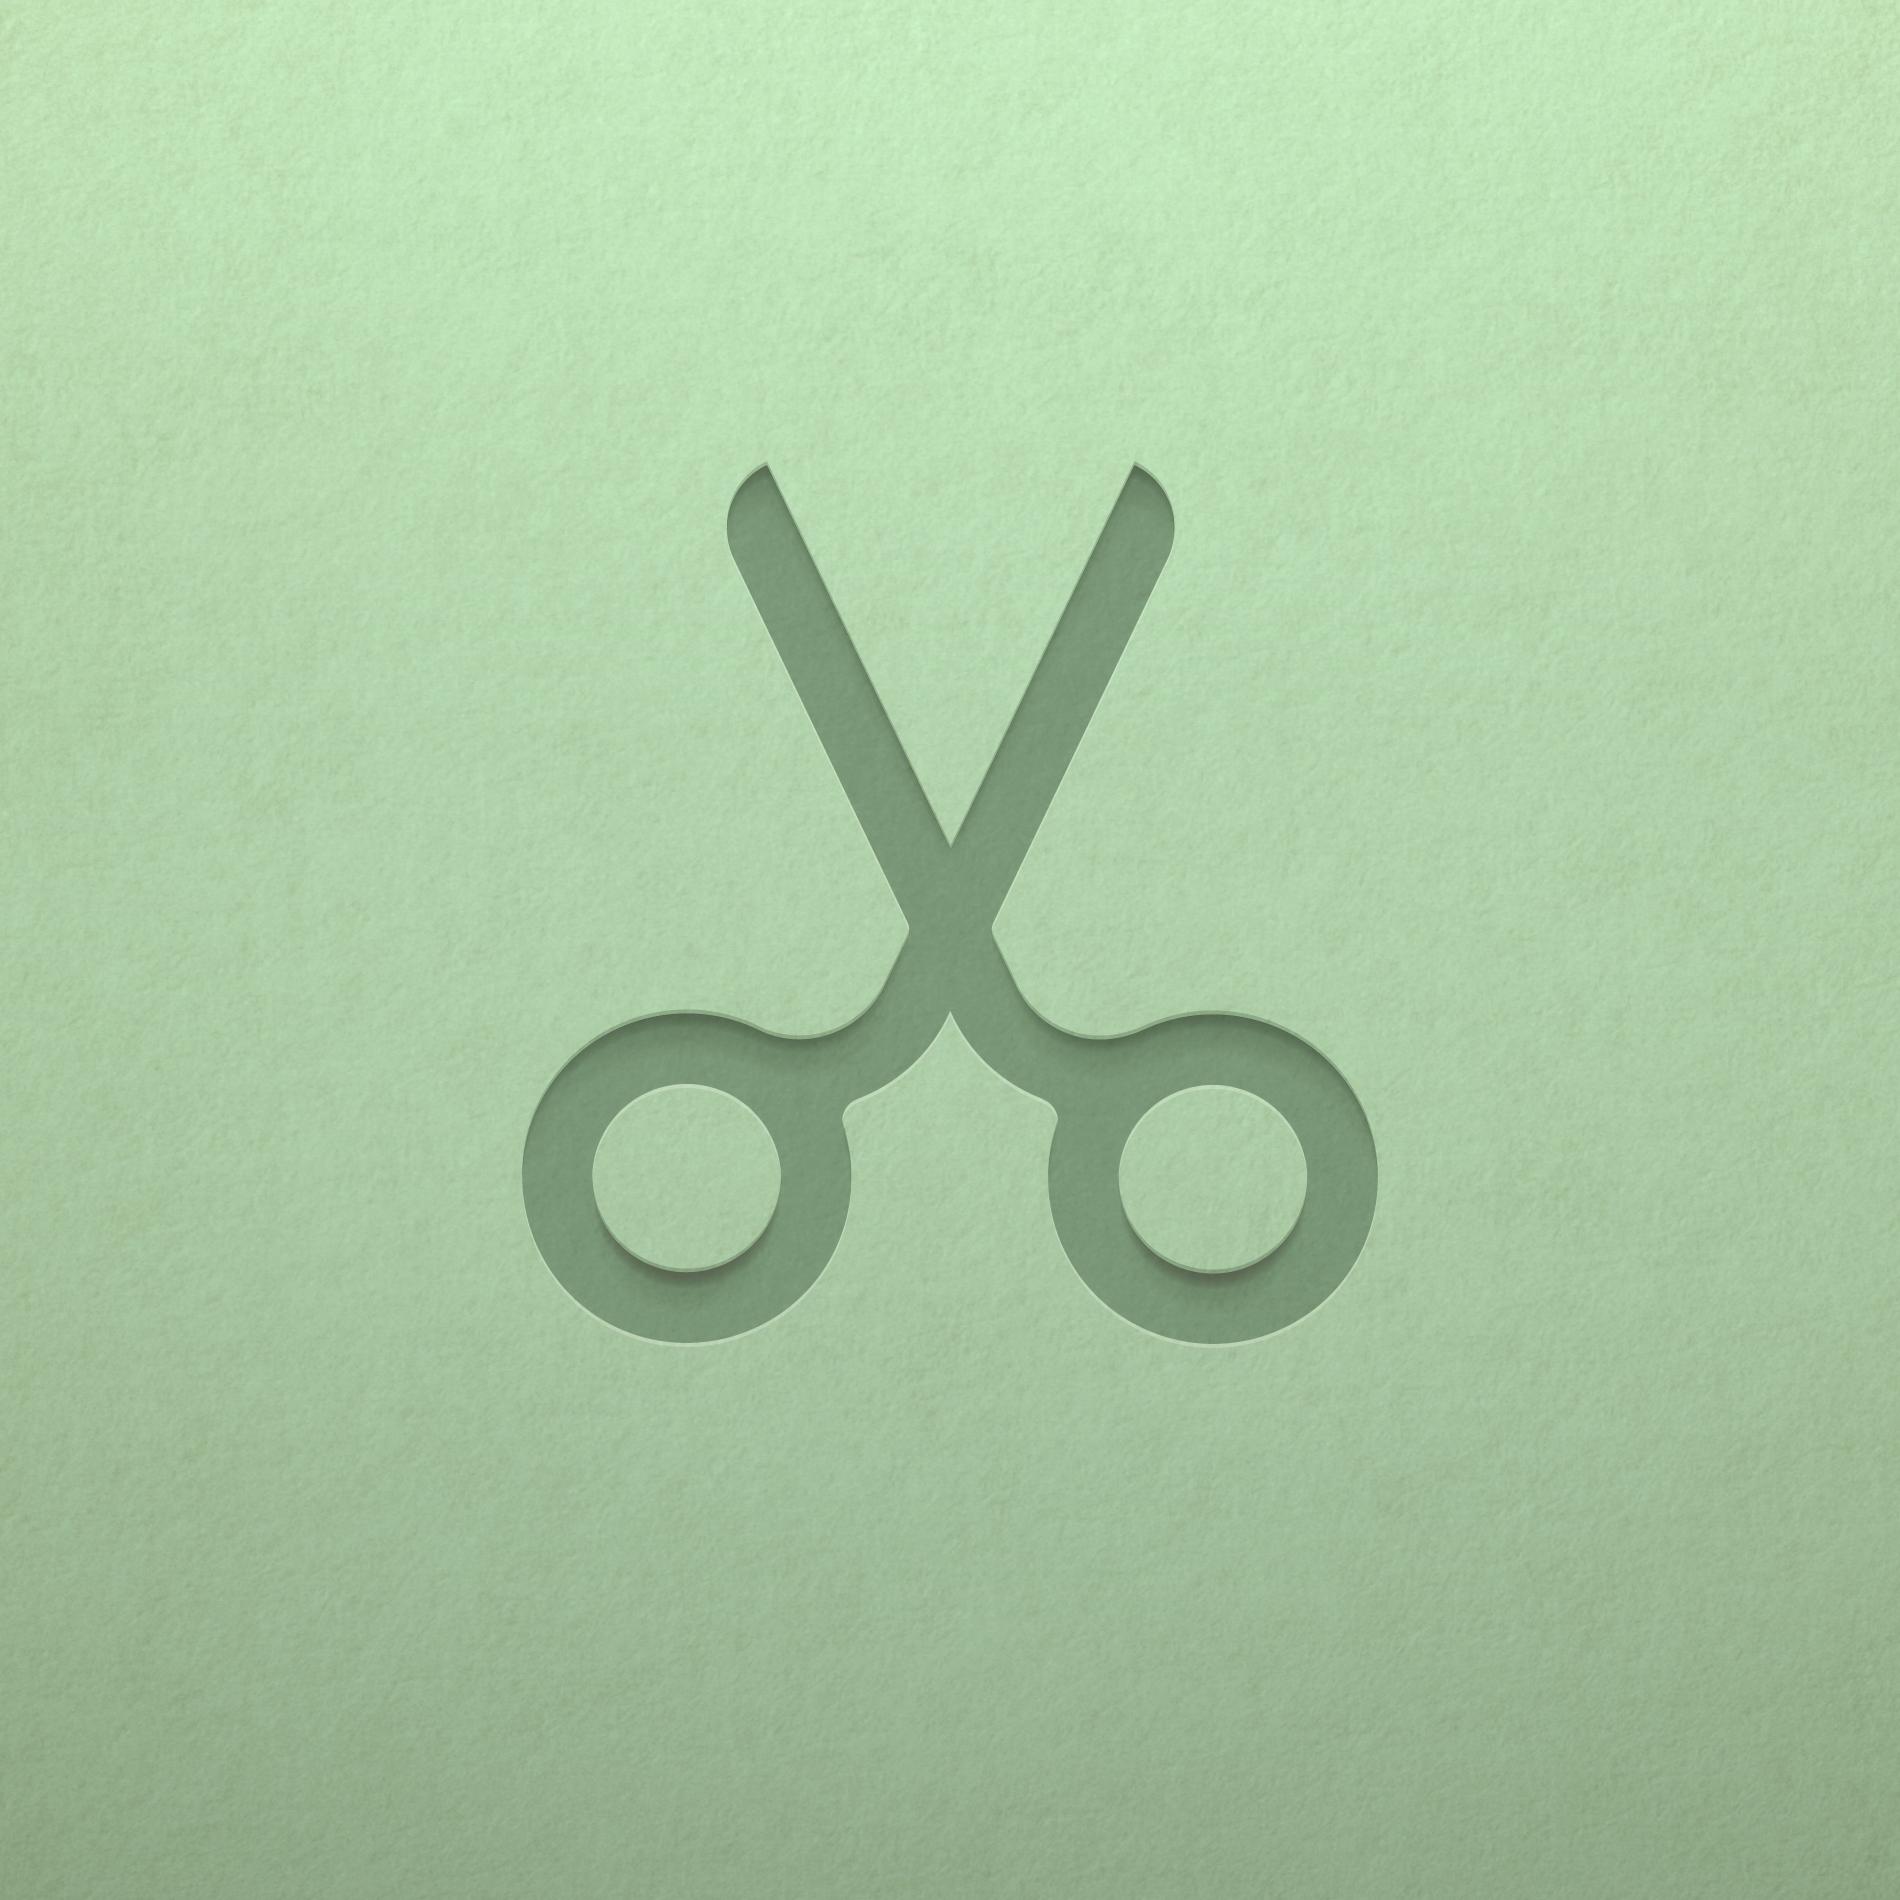 Scissors-1900px.png